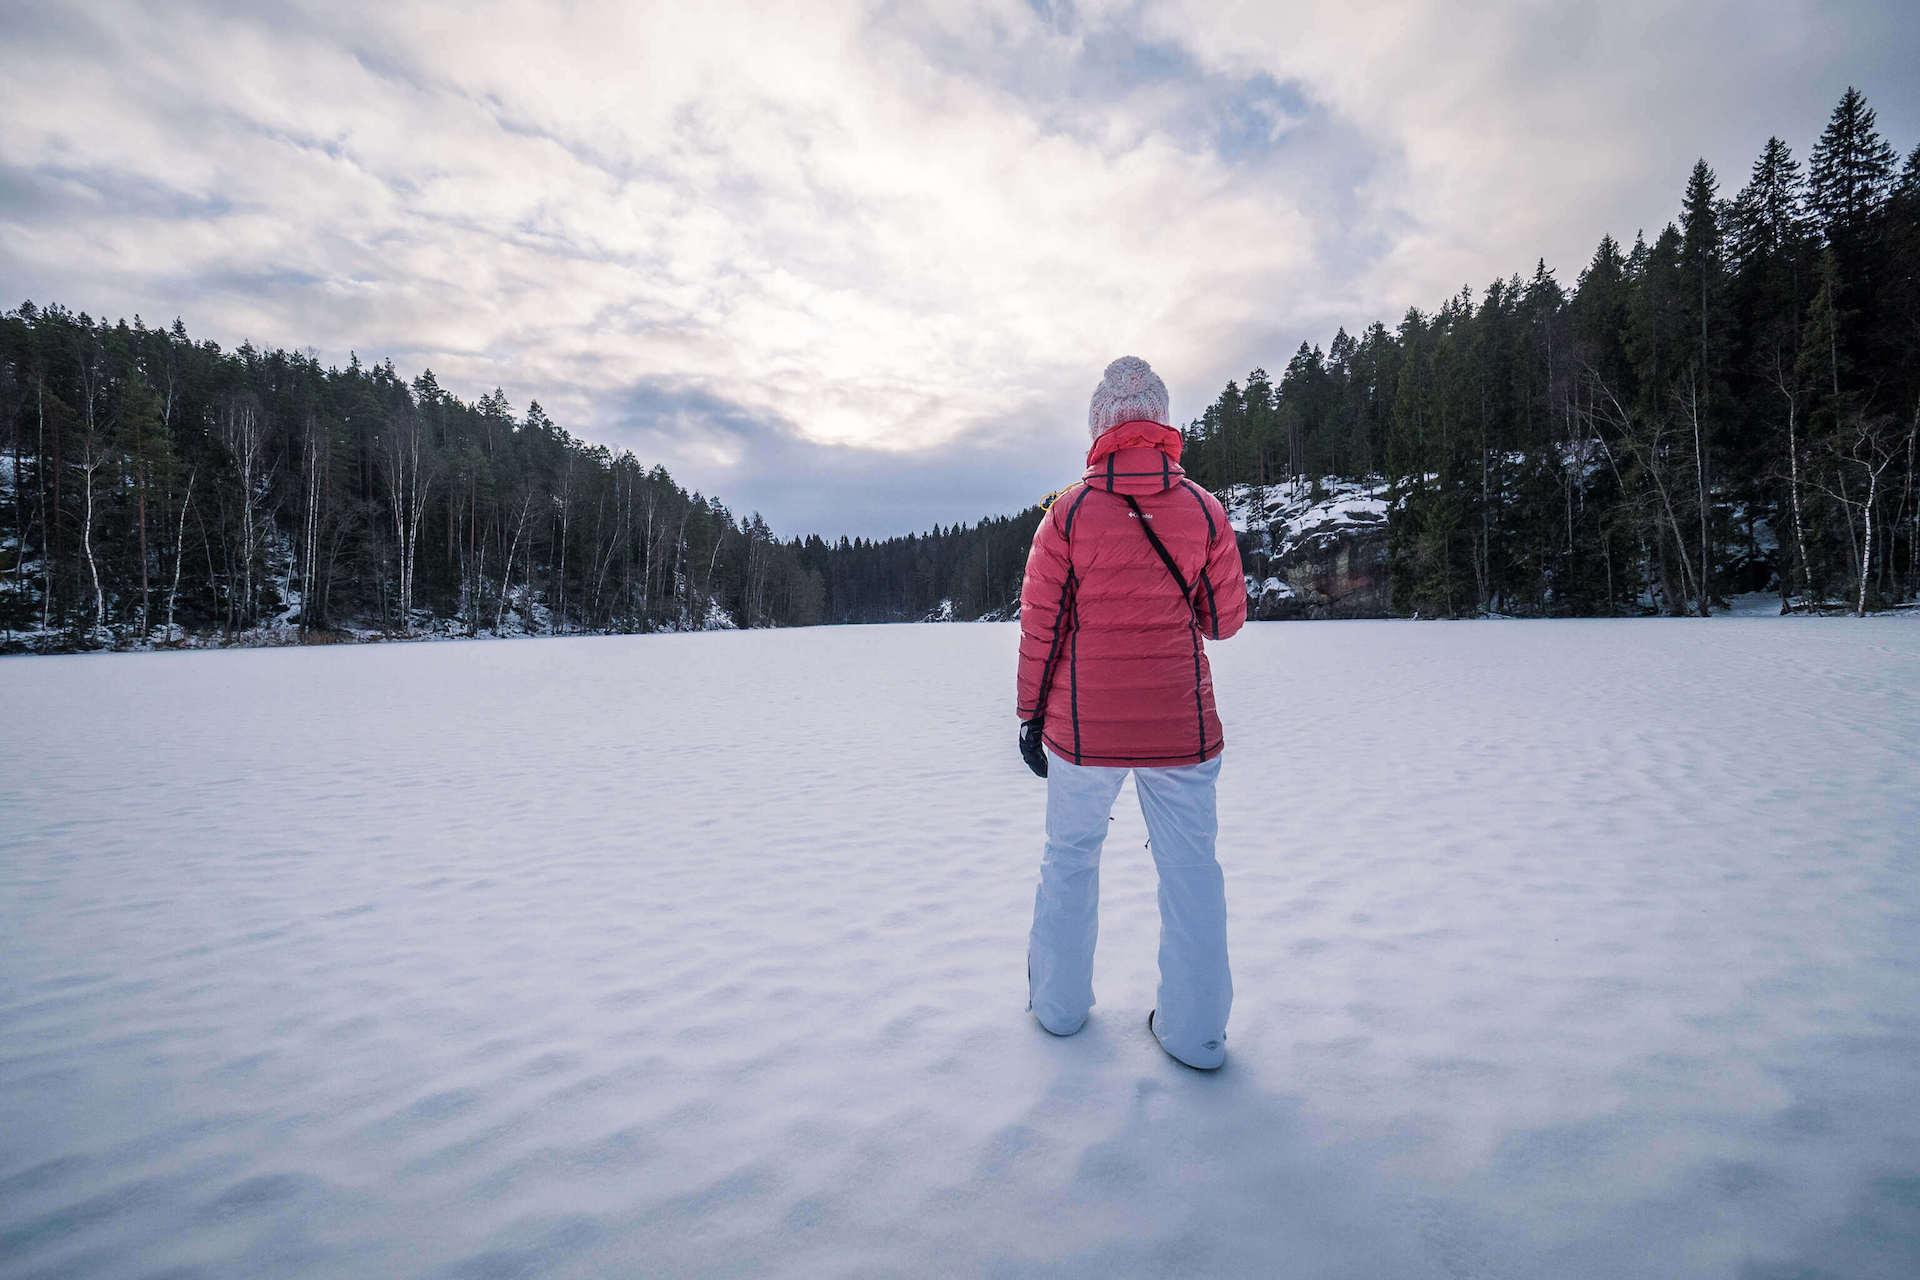 Voyage en amoureux en Finlande l'hiver